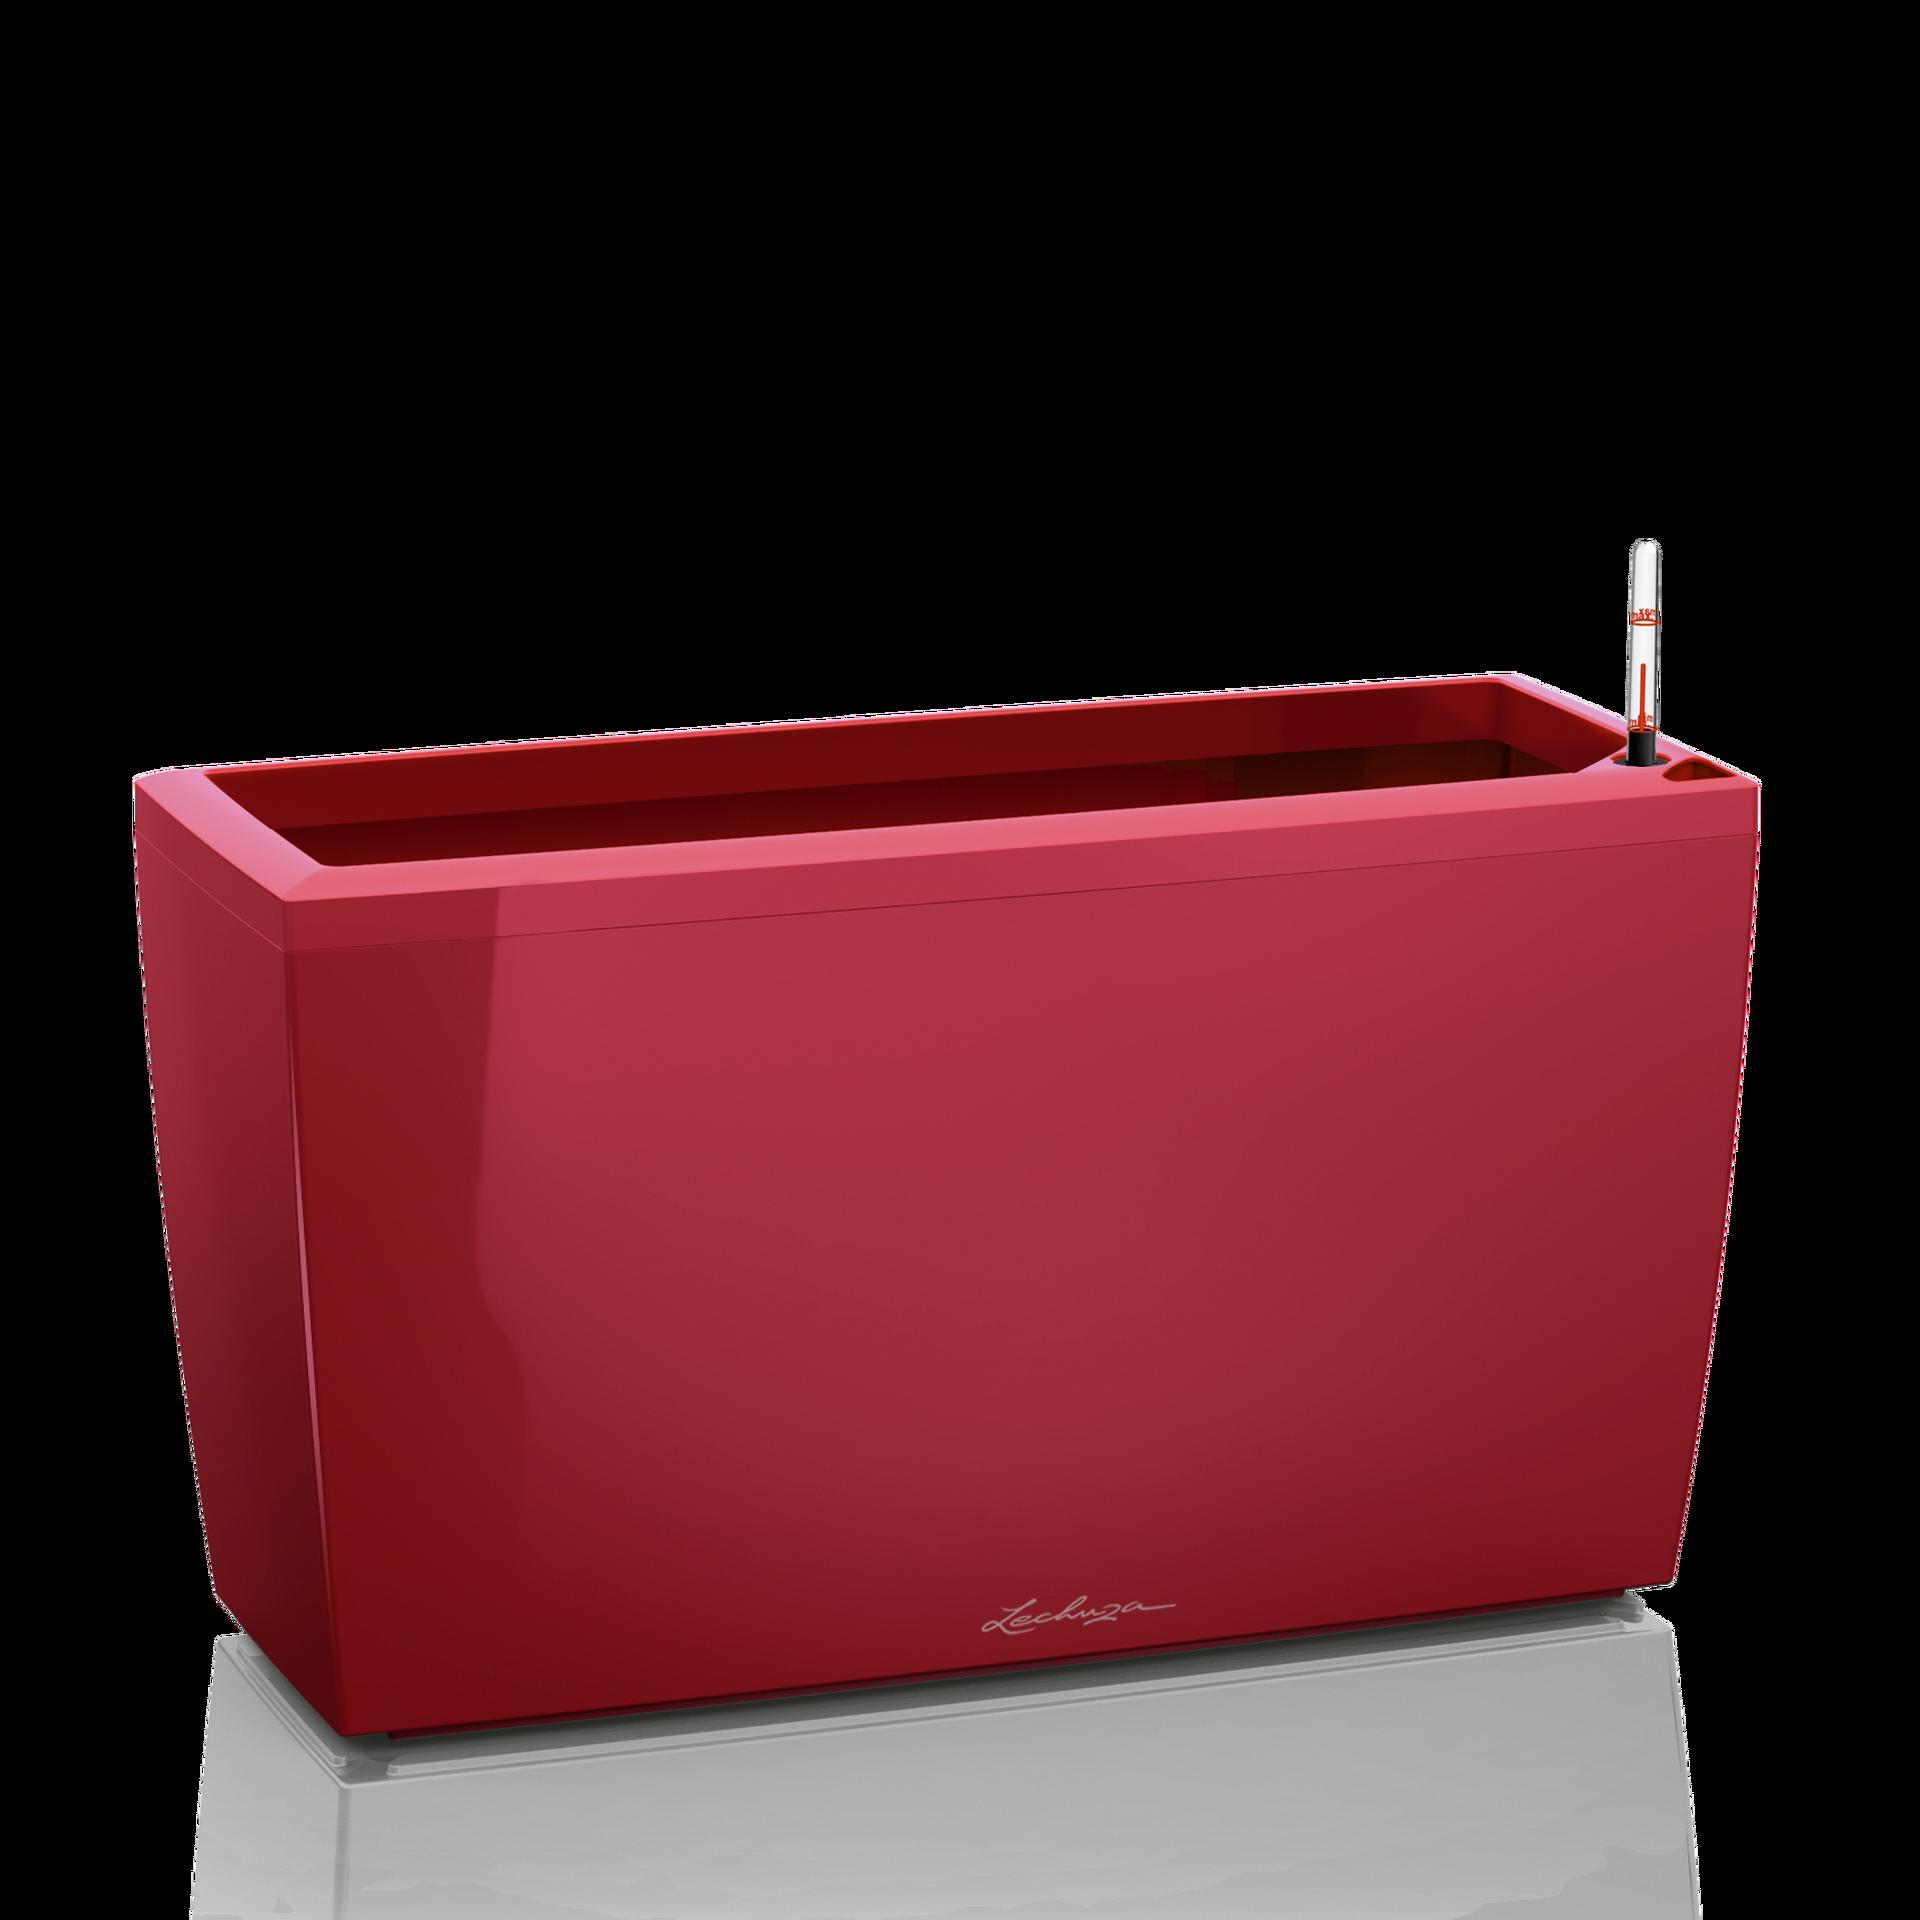 CARARO scarlet rot hochglanz